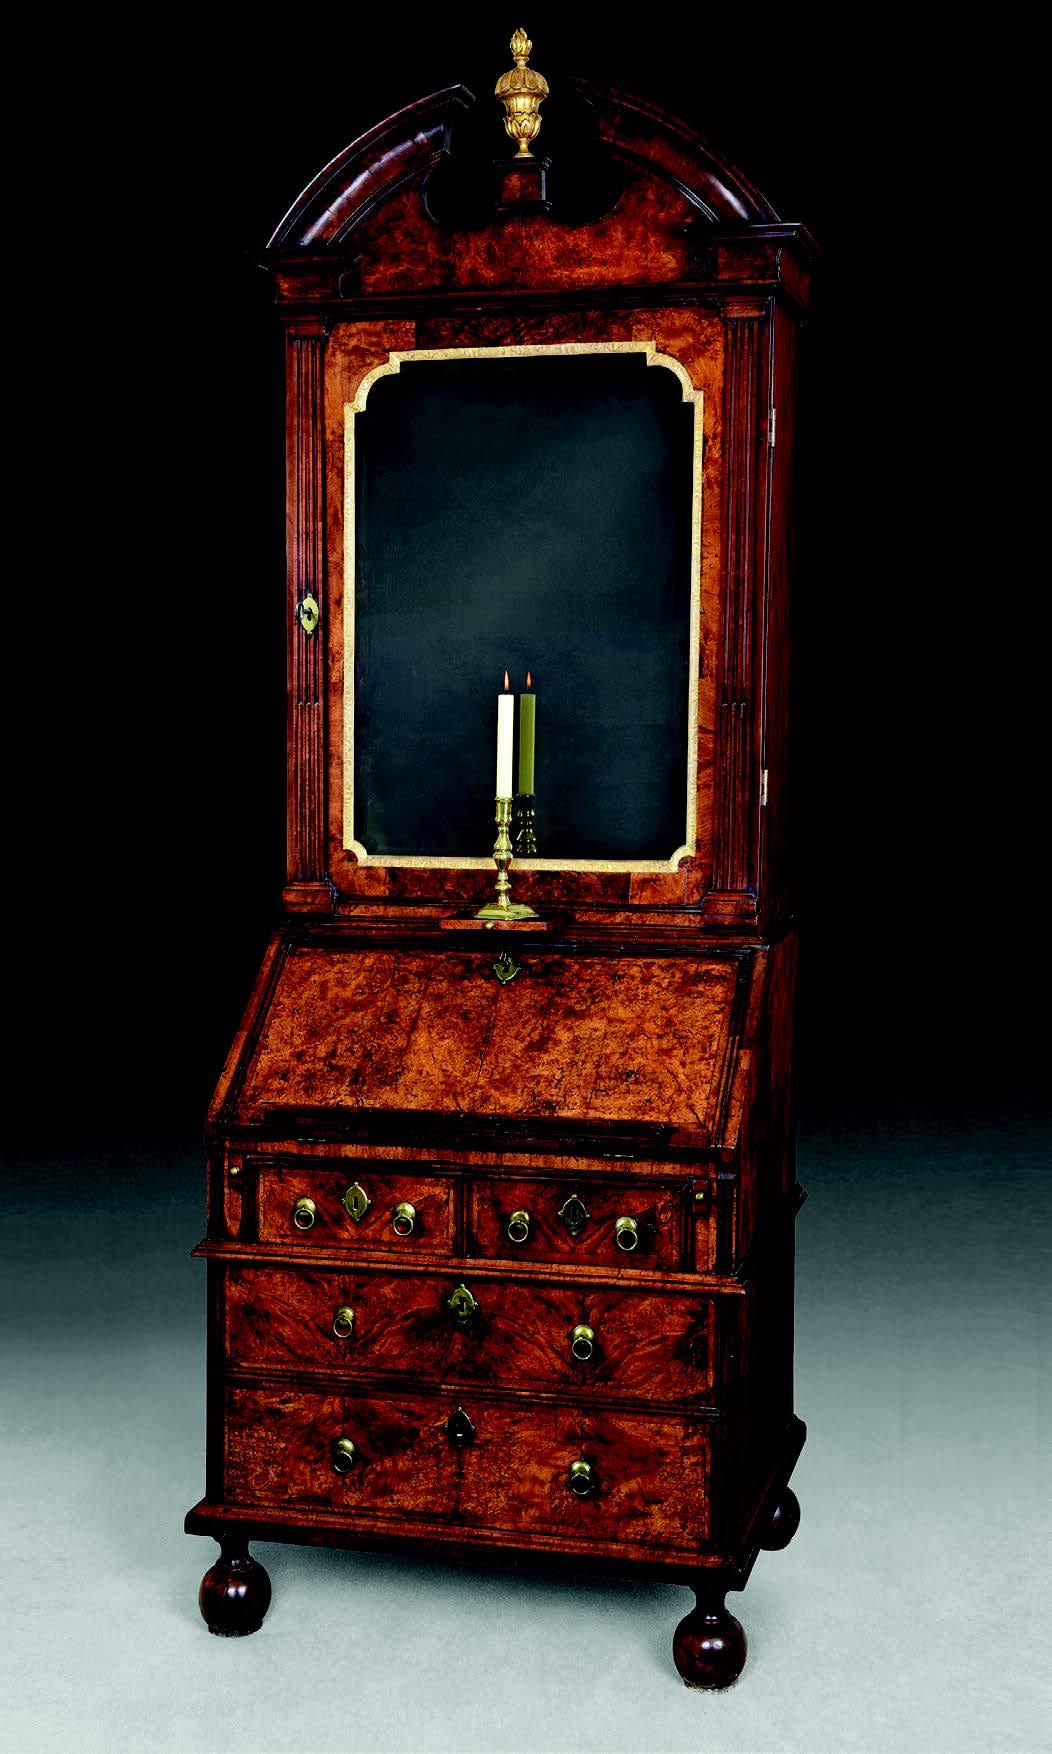 Early 18th-century burr walnut bureau bookcase